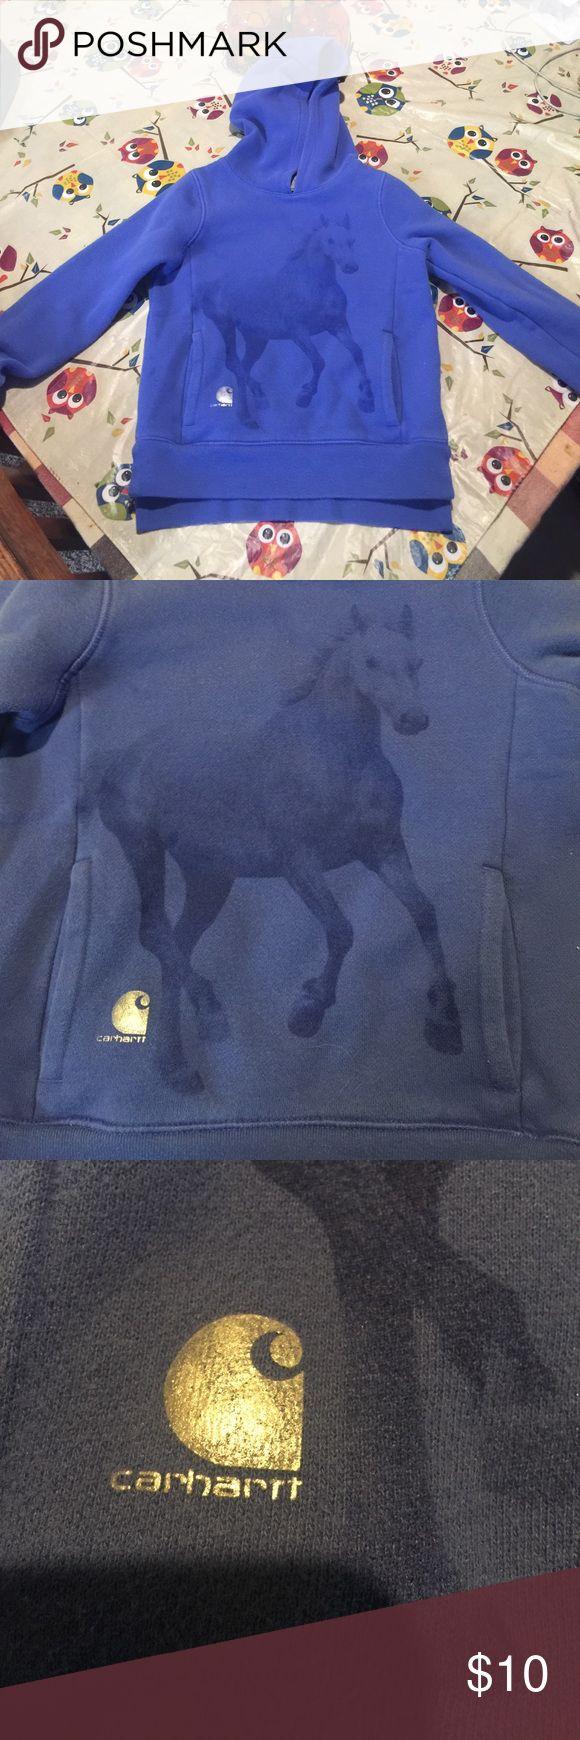 Horse sweatshirt!! Like new supreme condition carhartt sweatshirt Carhartt Shirts & Tops Sweatshirts & Hoodies